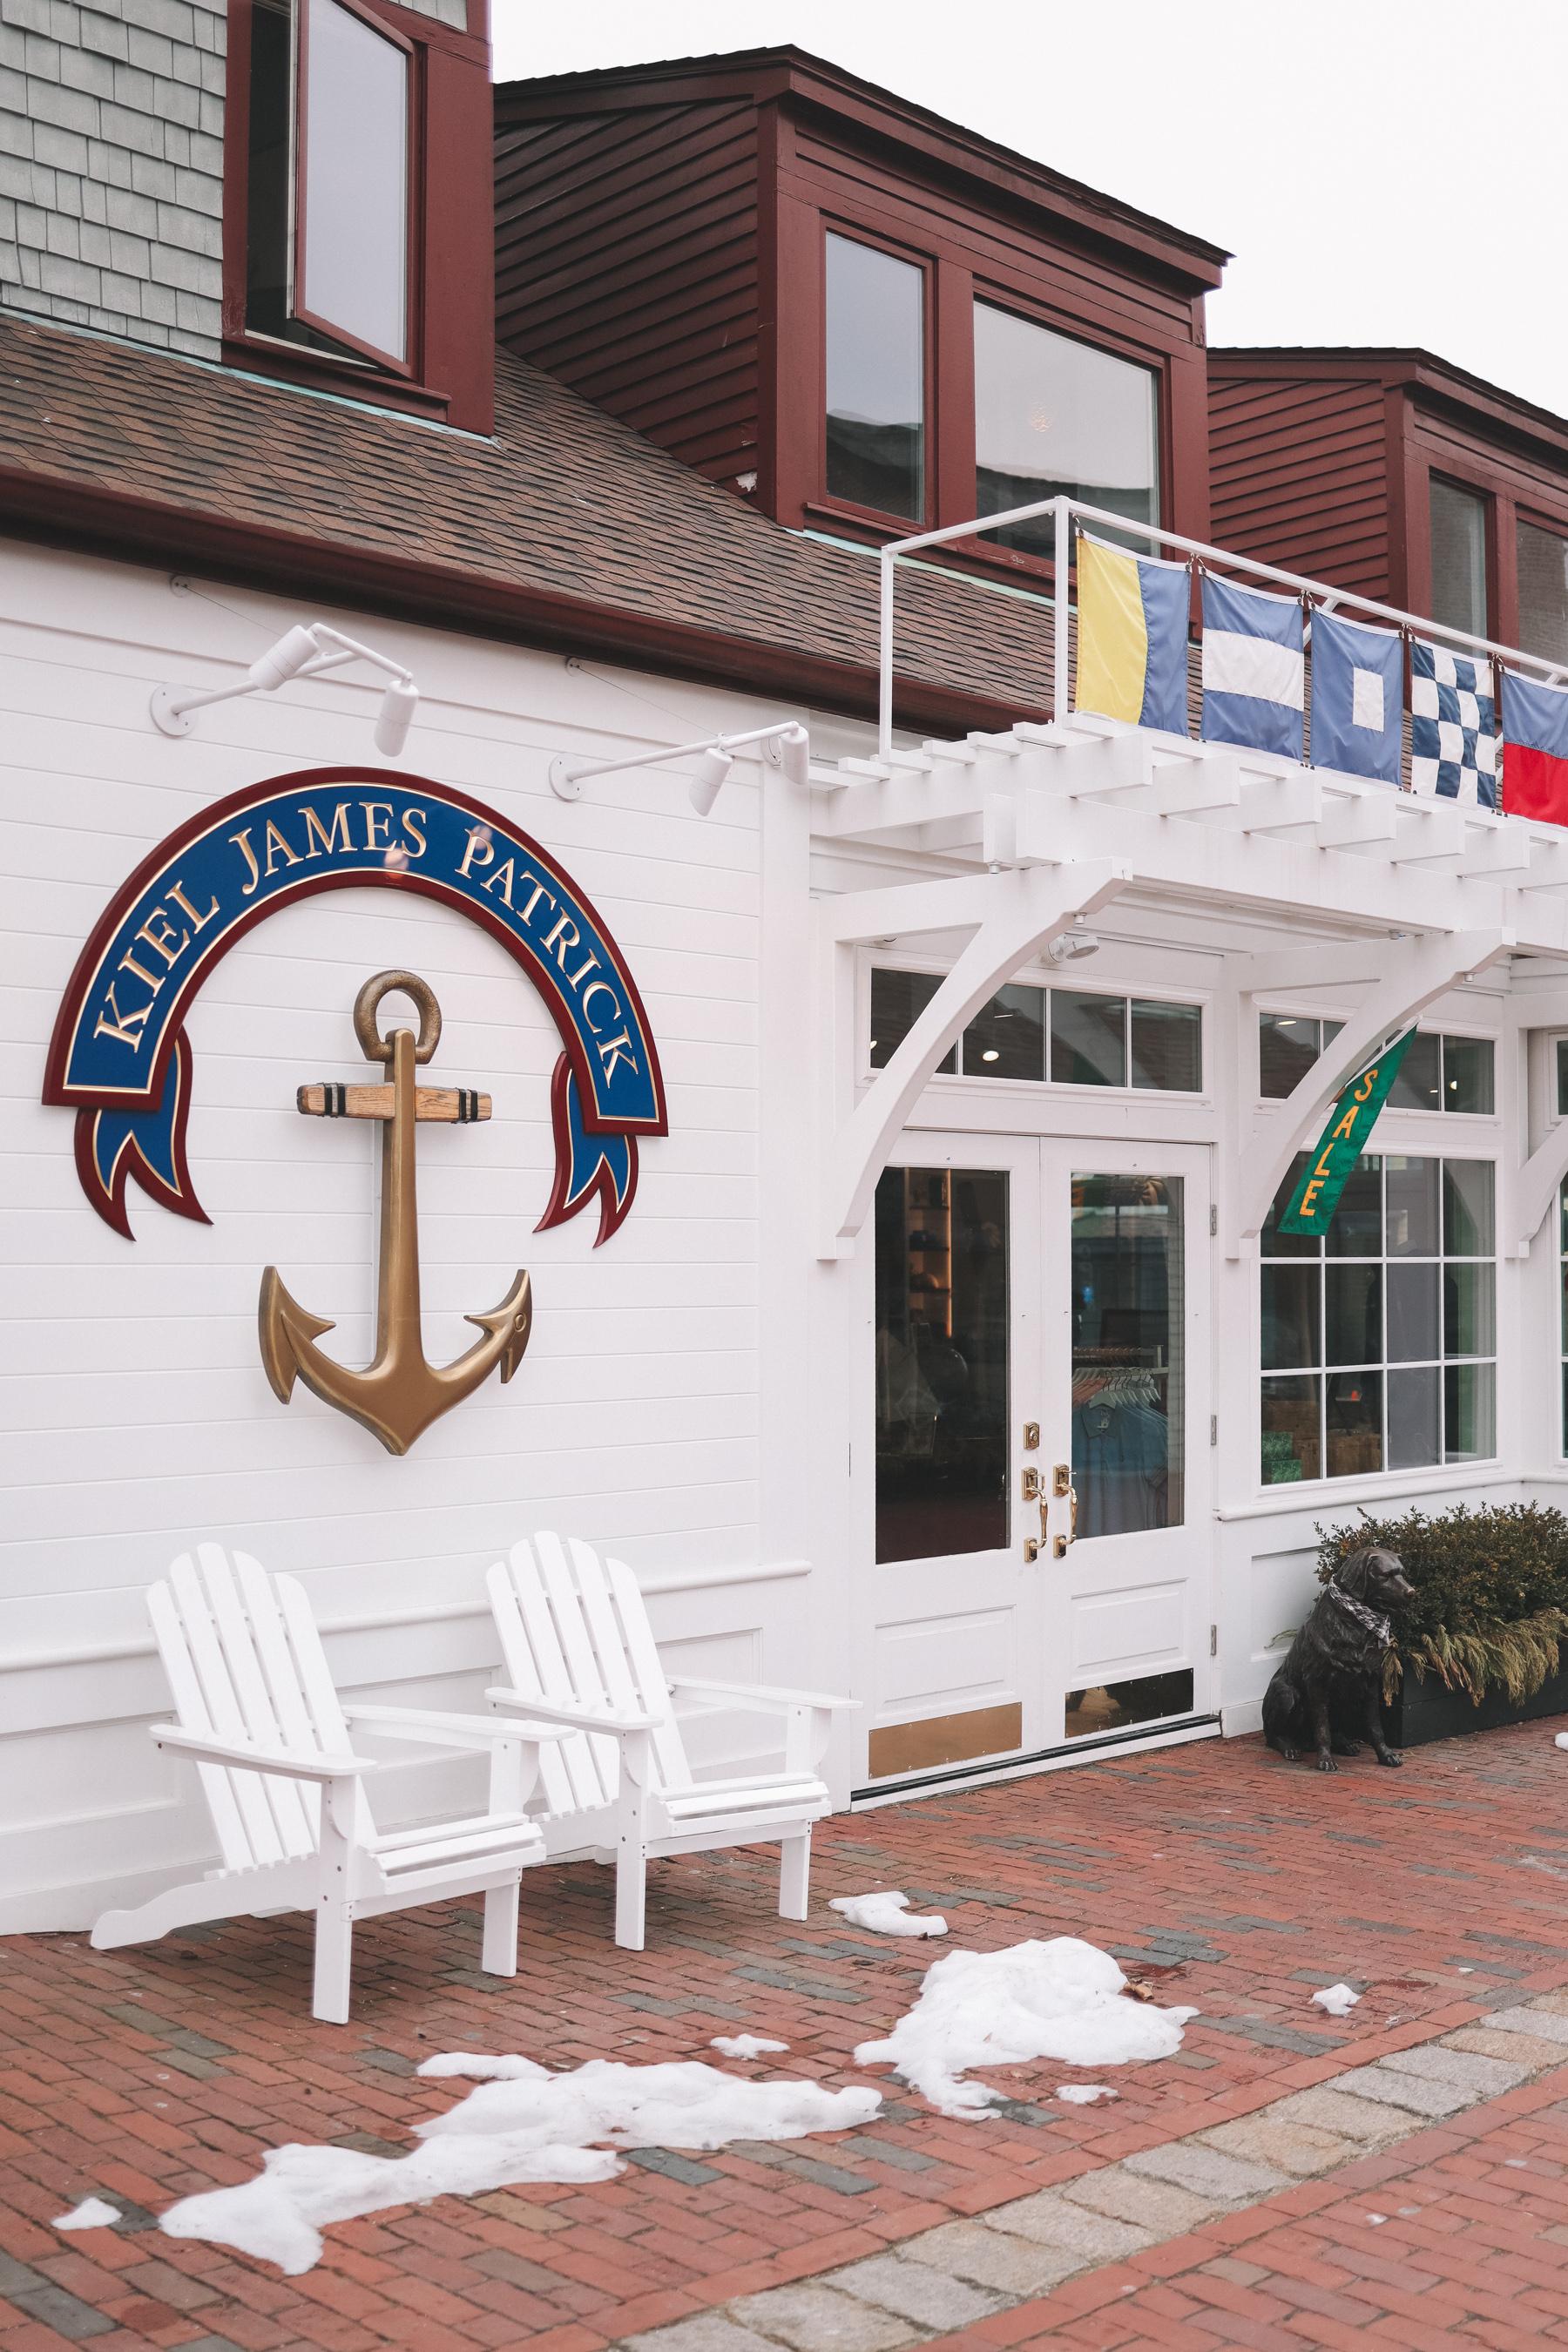 Day 1 in Newport, Rhode Island - Kiel James Patrick